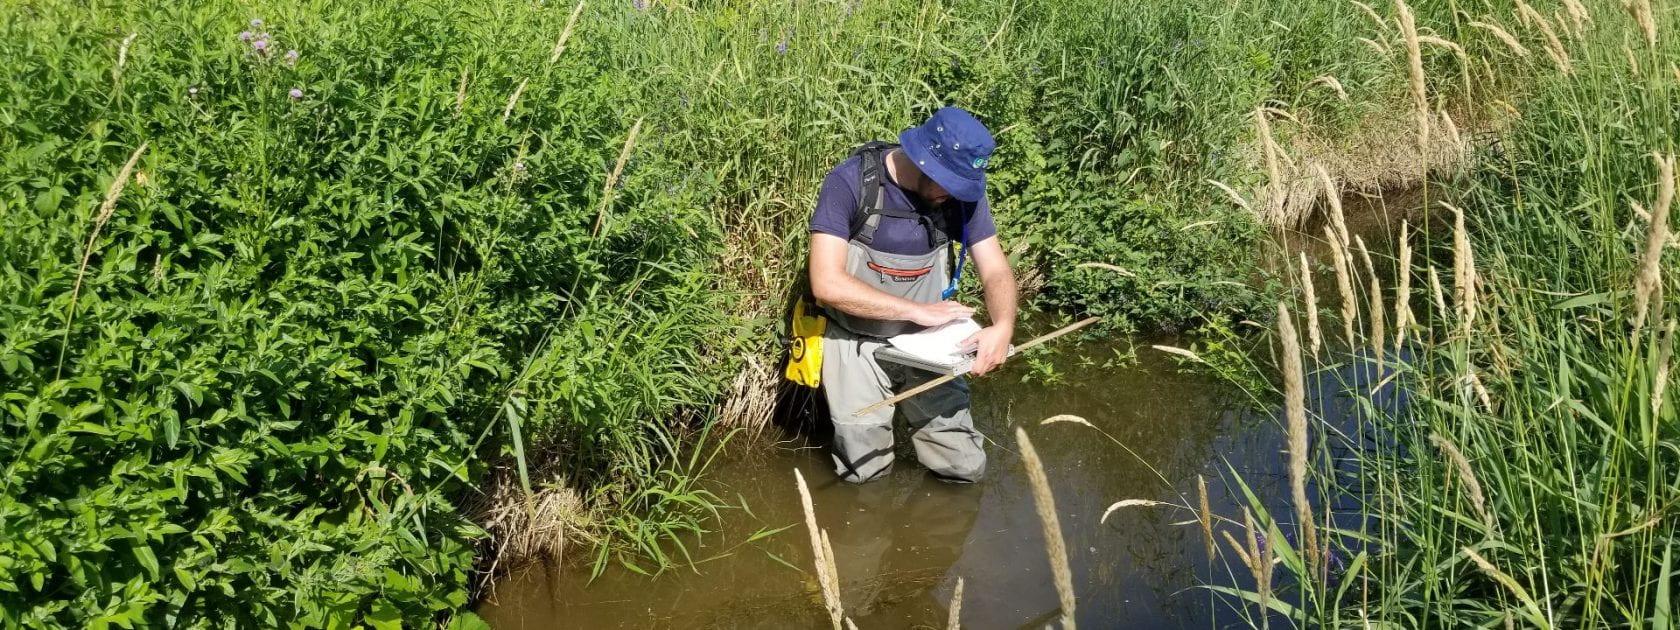 Student taking water samples in wetland